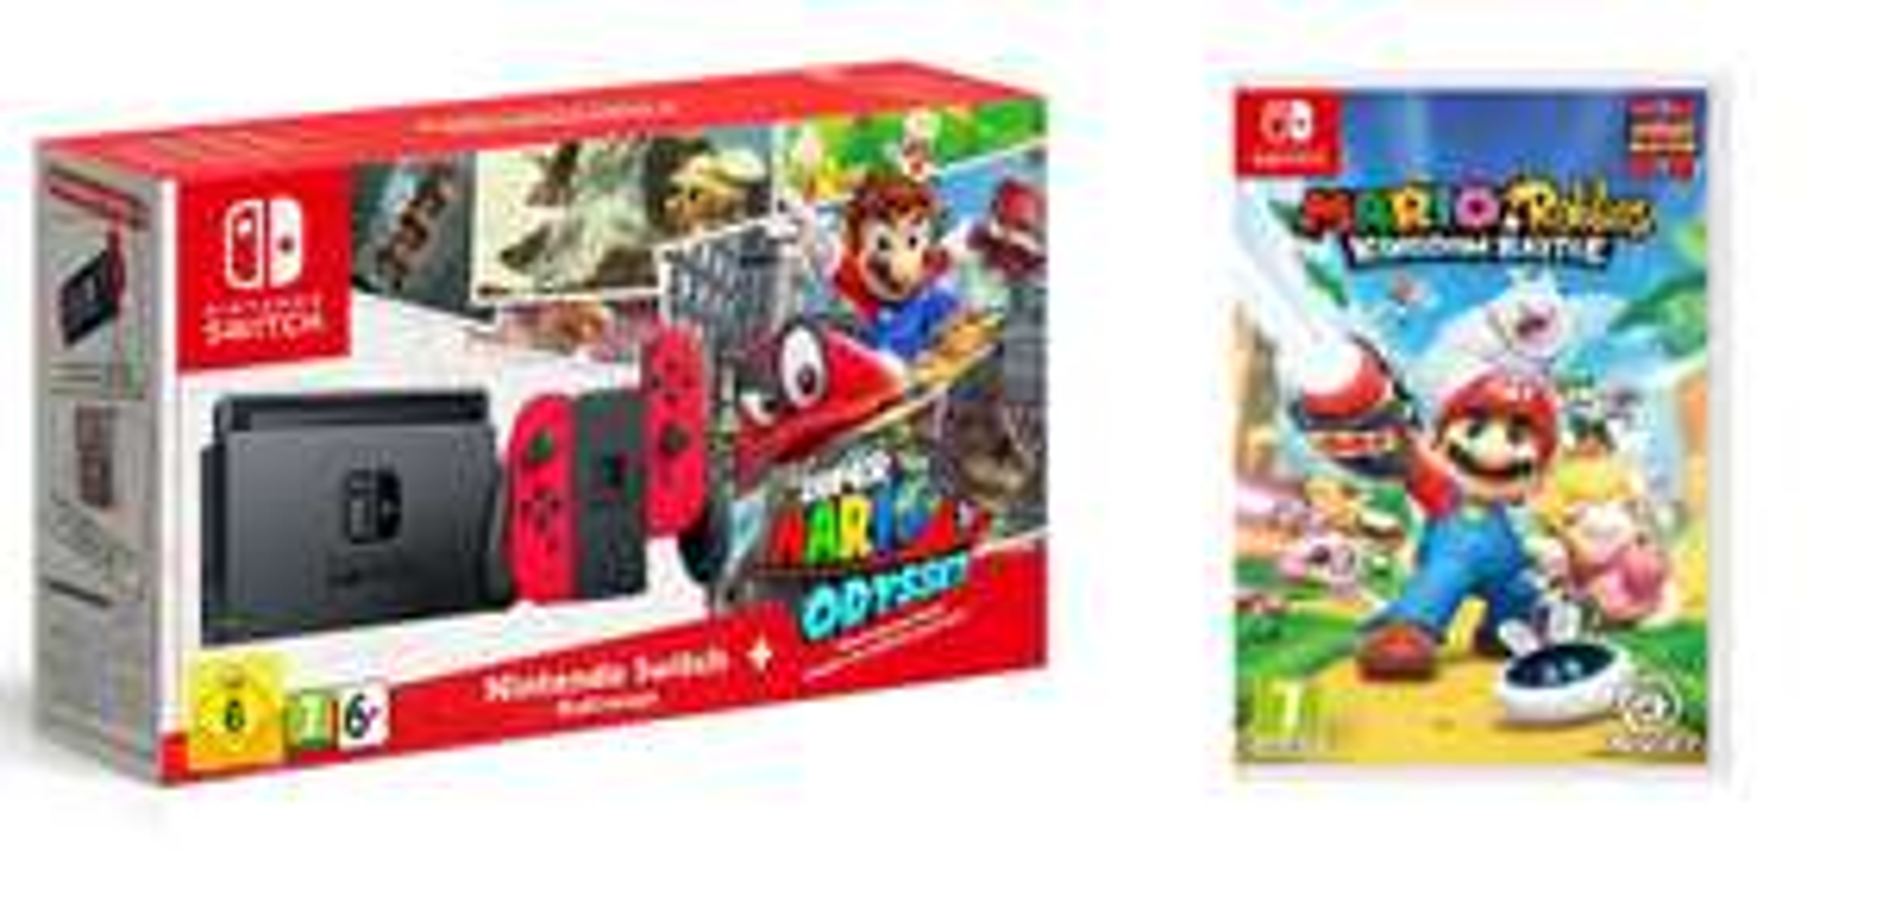 [In Stock now] Nintendo Switch Super Mario Odyssey Limited Edition + Mario Rabbids Kingdom Battle £329.99 @ Tesco Direct